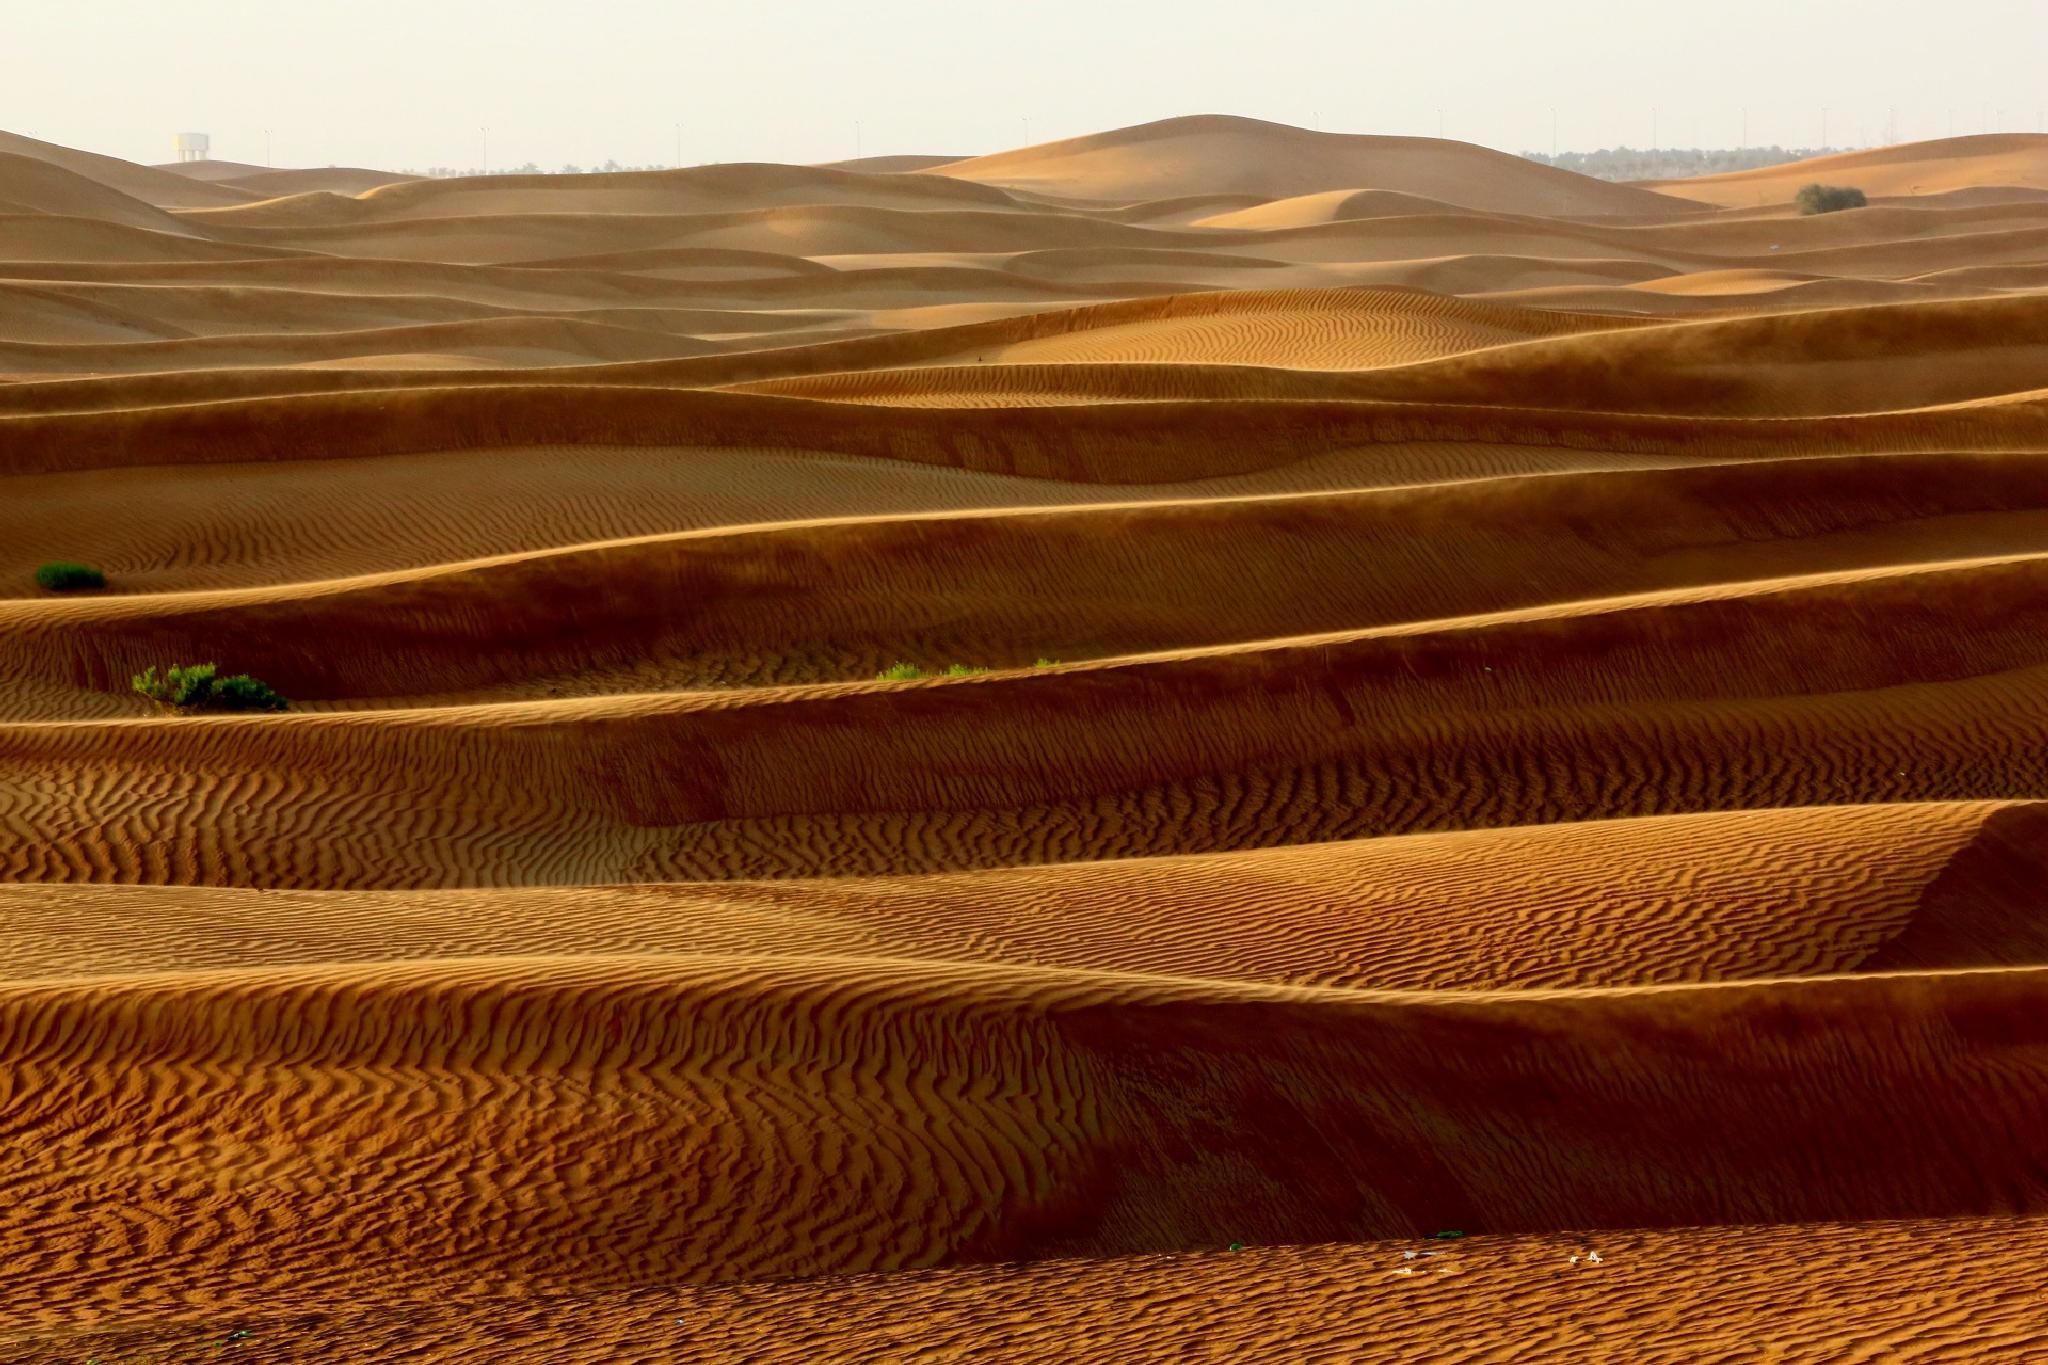 Beauty of undulating sand dunes by zenilk